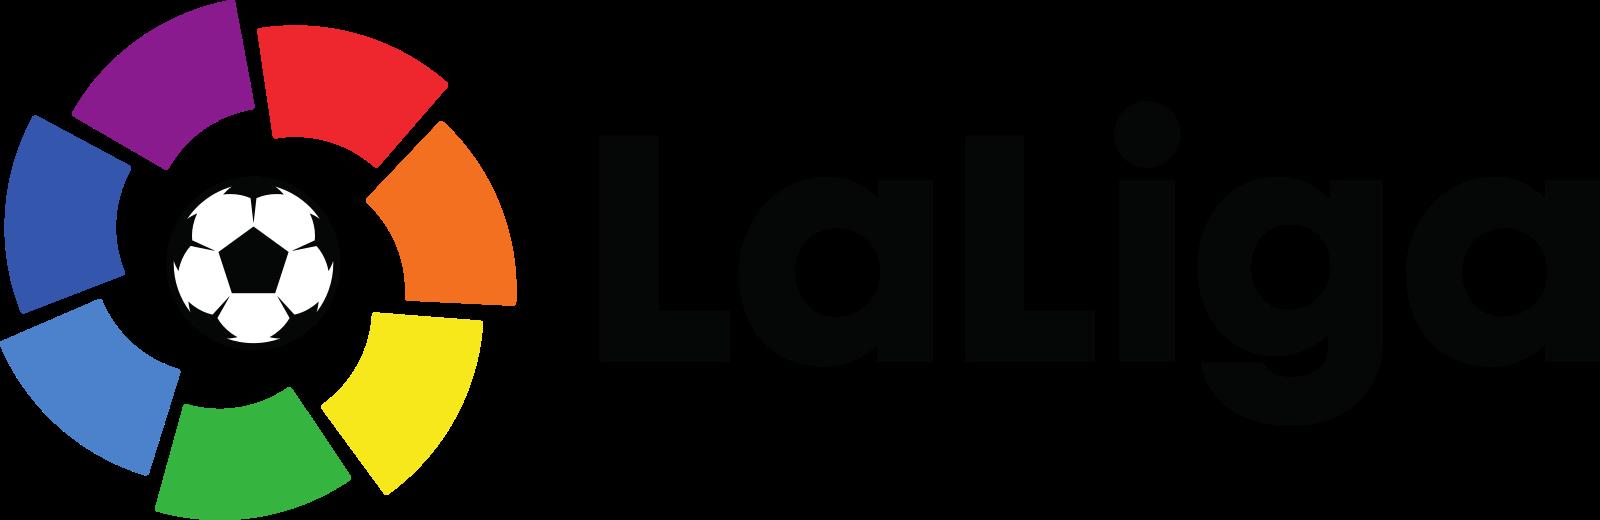 laliga logo 5 - LaLiga Logo – Campeonato Español de Fútbol